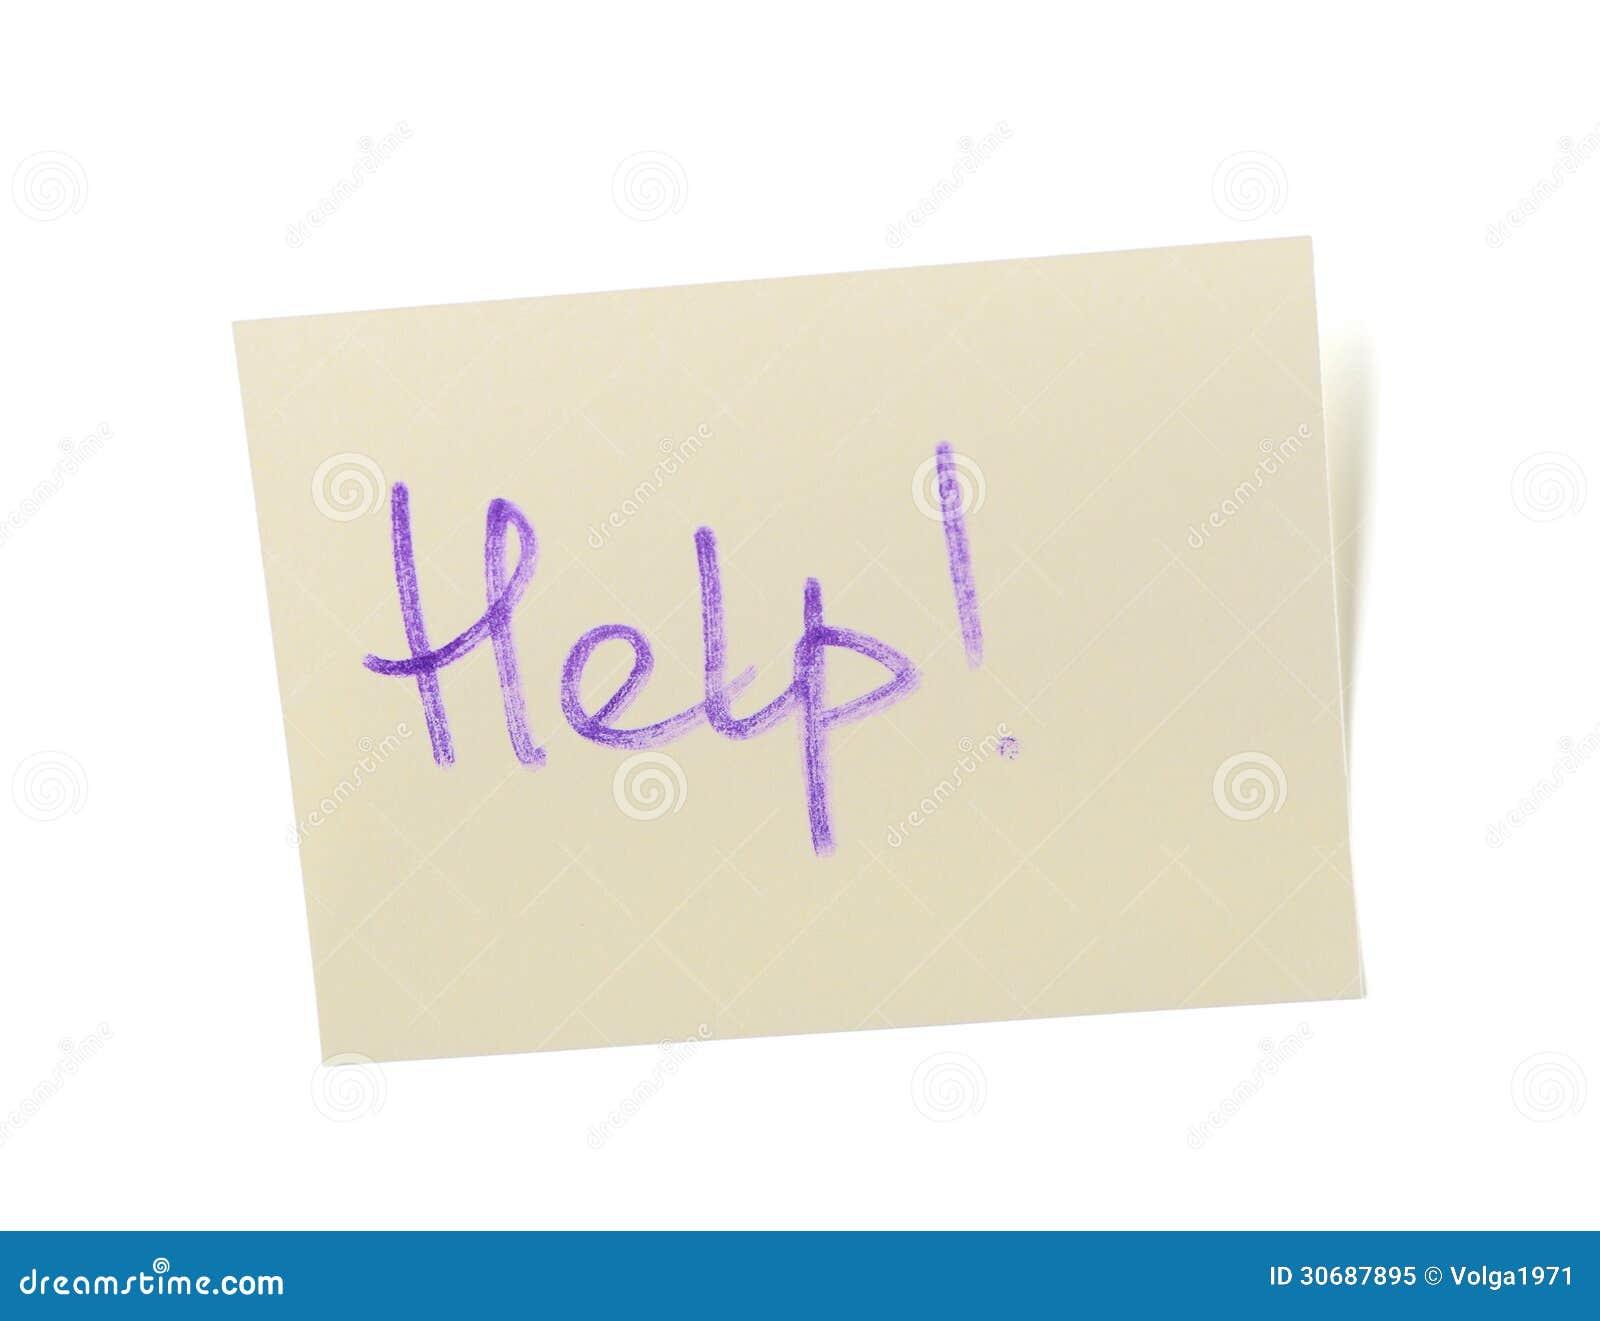 Papaer help